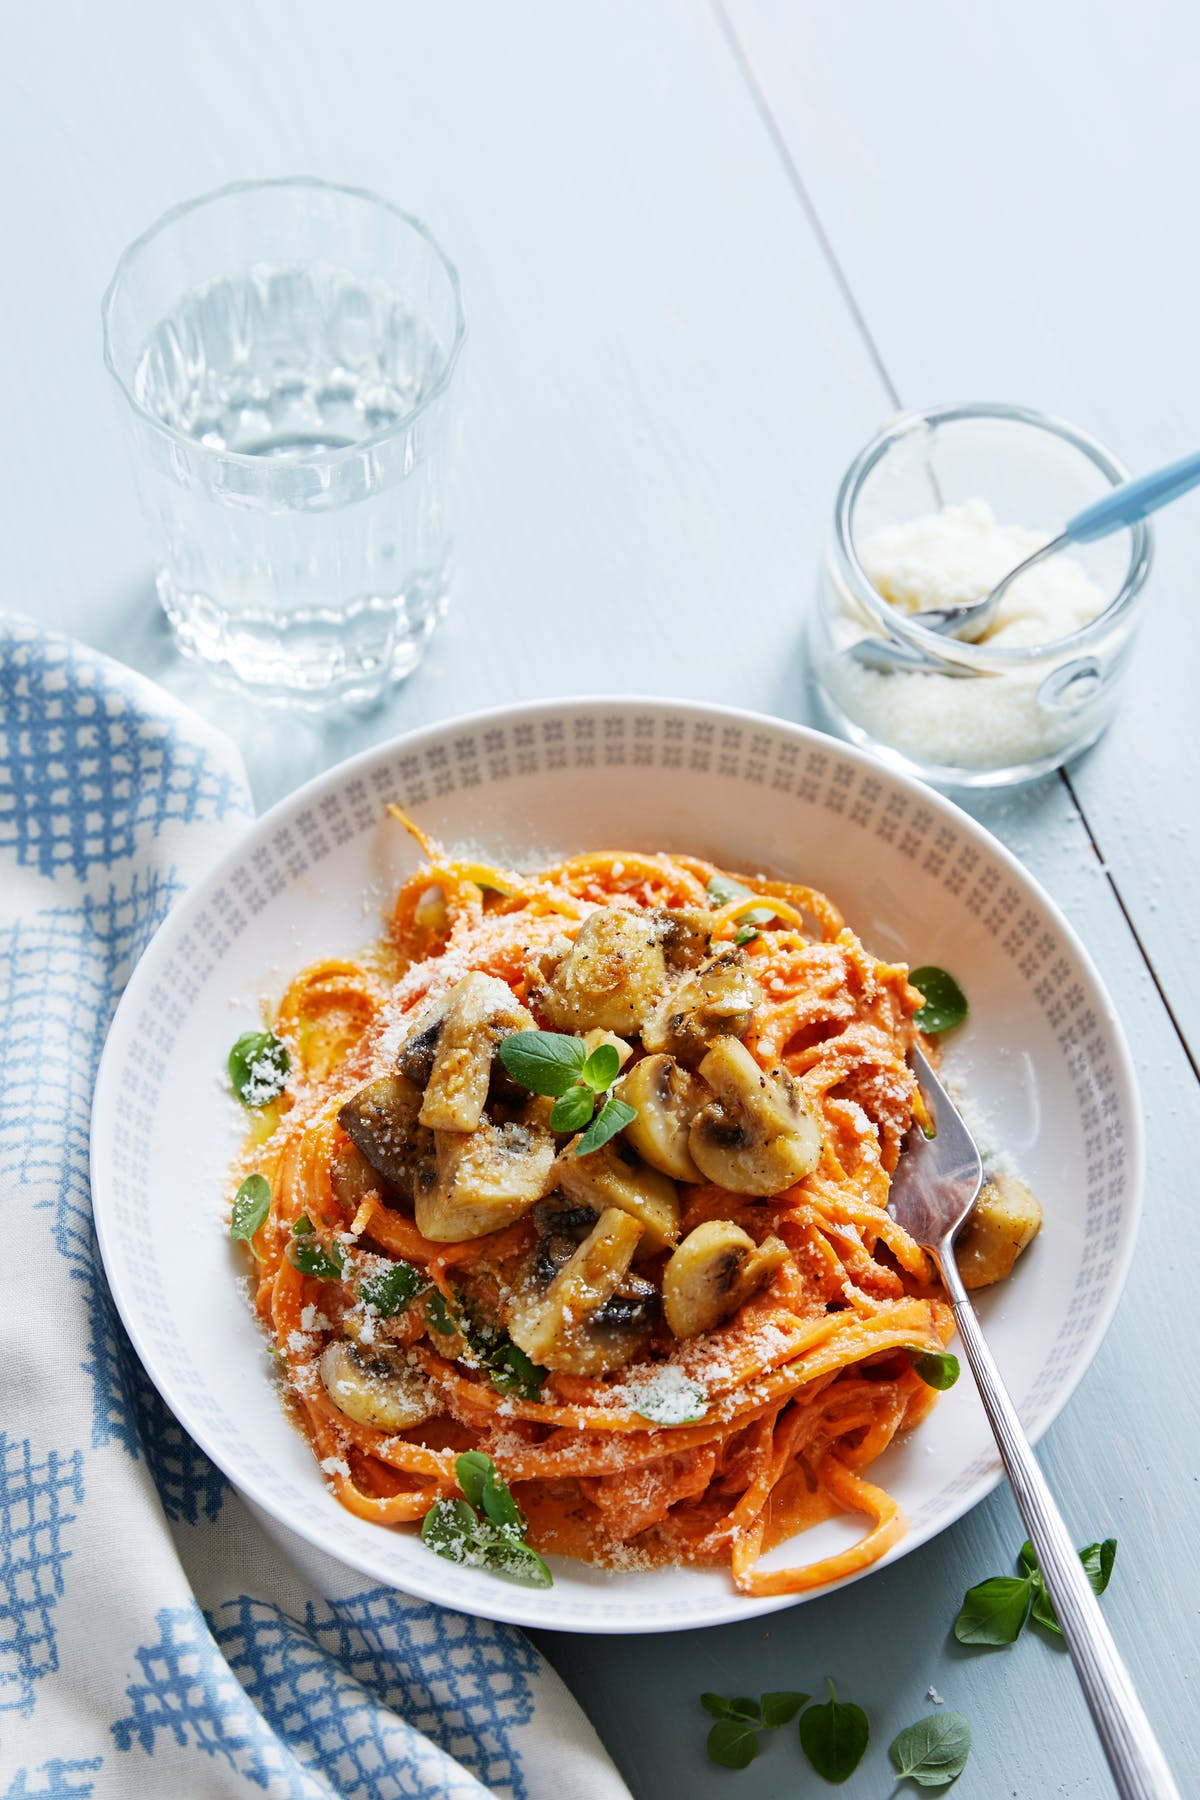 Pasta de zapallo anco con salsa de tomate y champiñones al ajillo